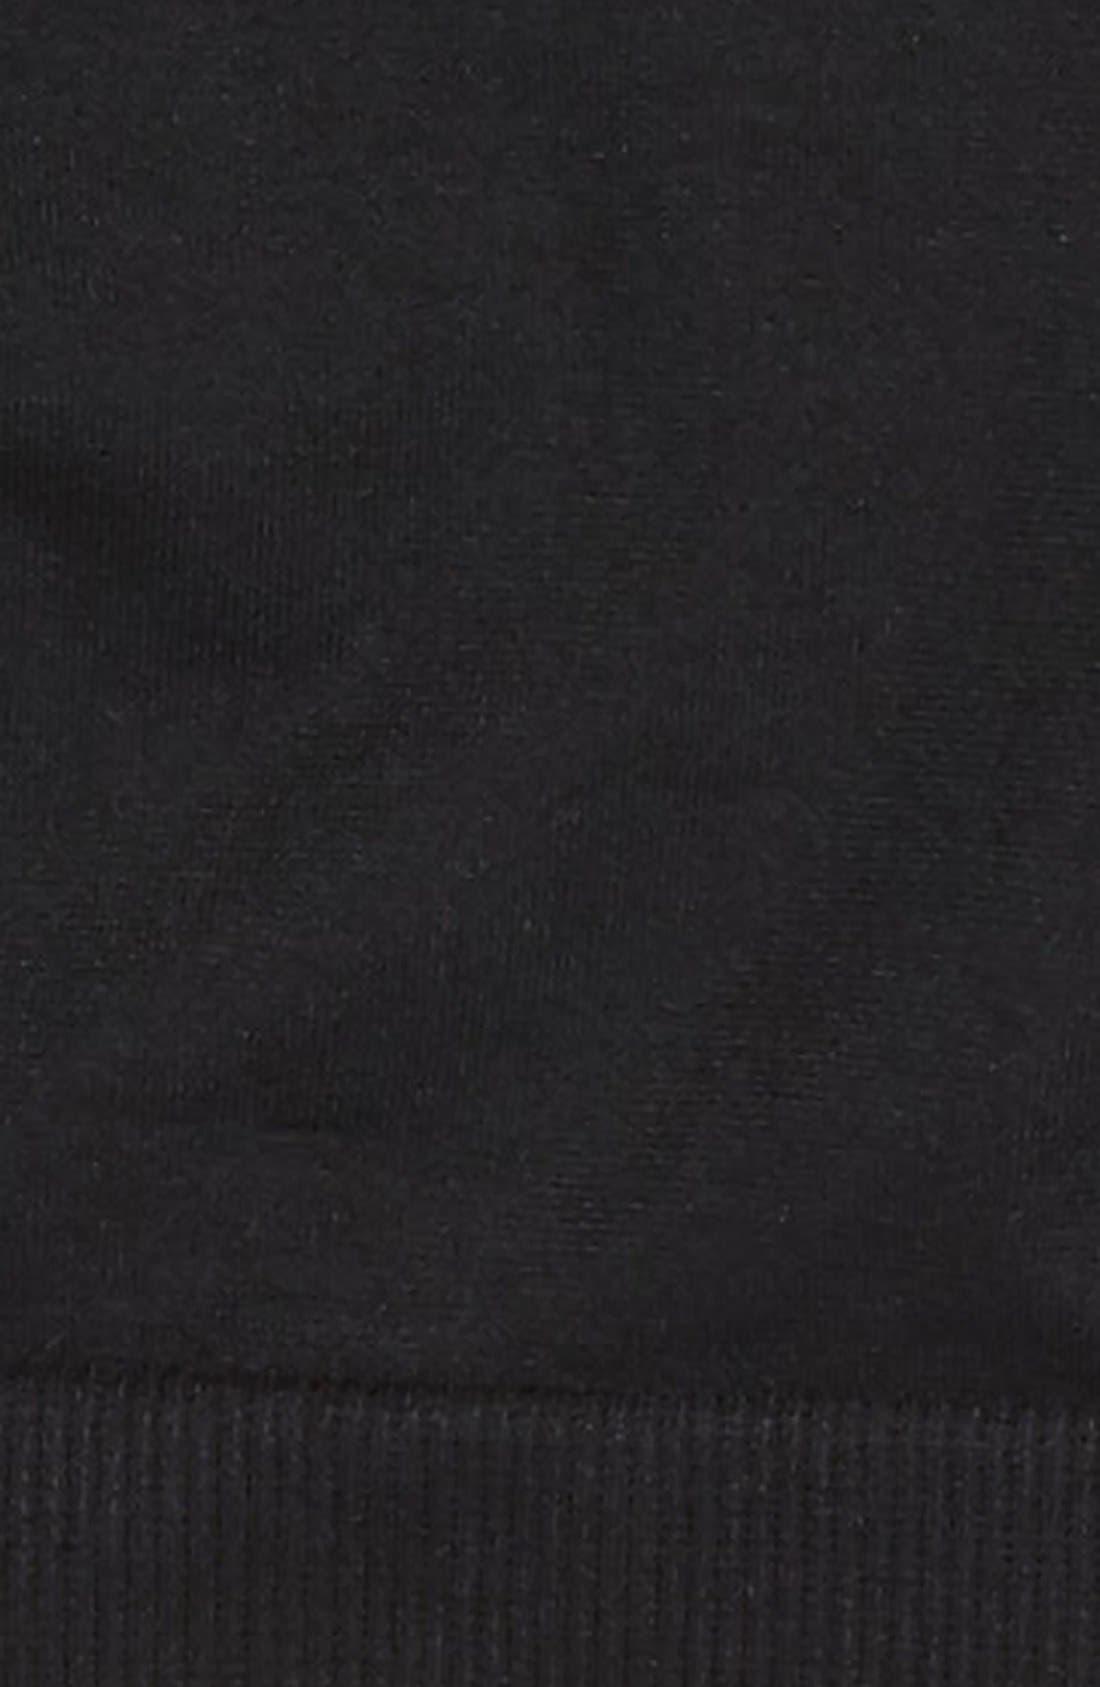 Strappy Bralette,                             Alternate thumbnail 3, color,                             BLACK